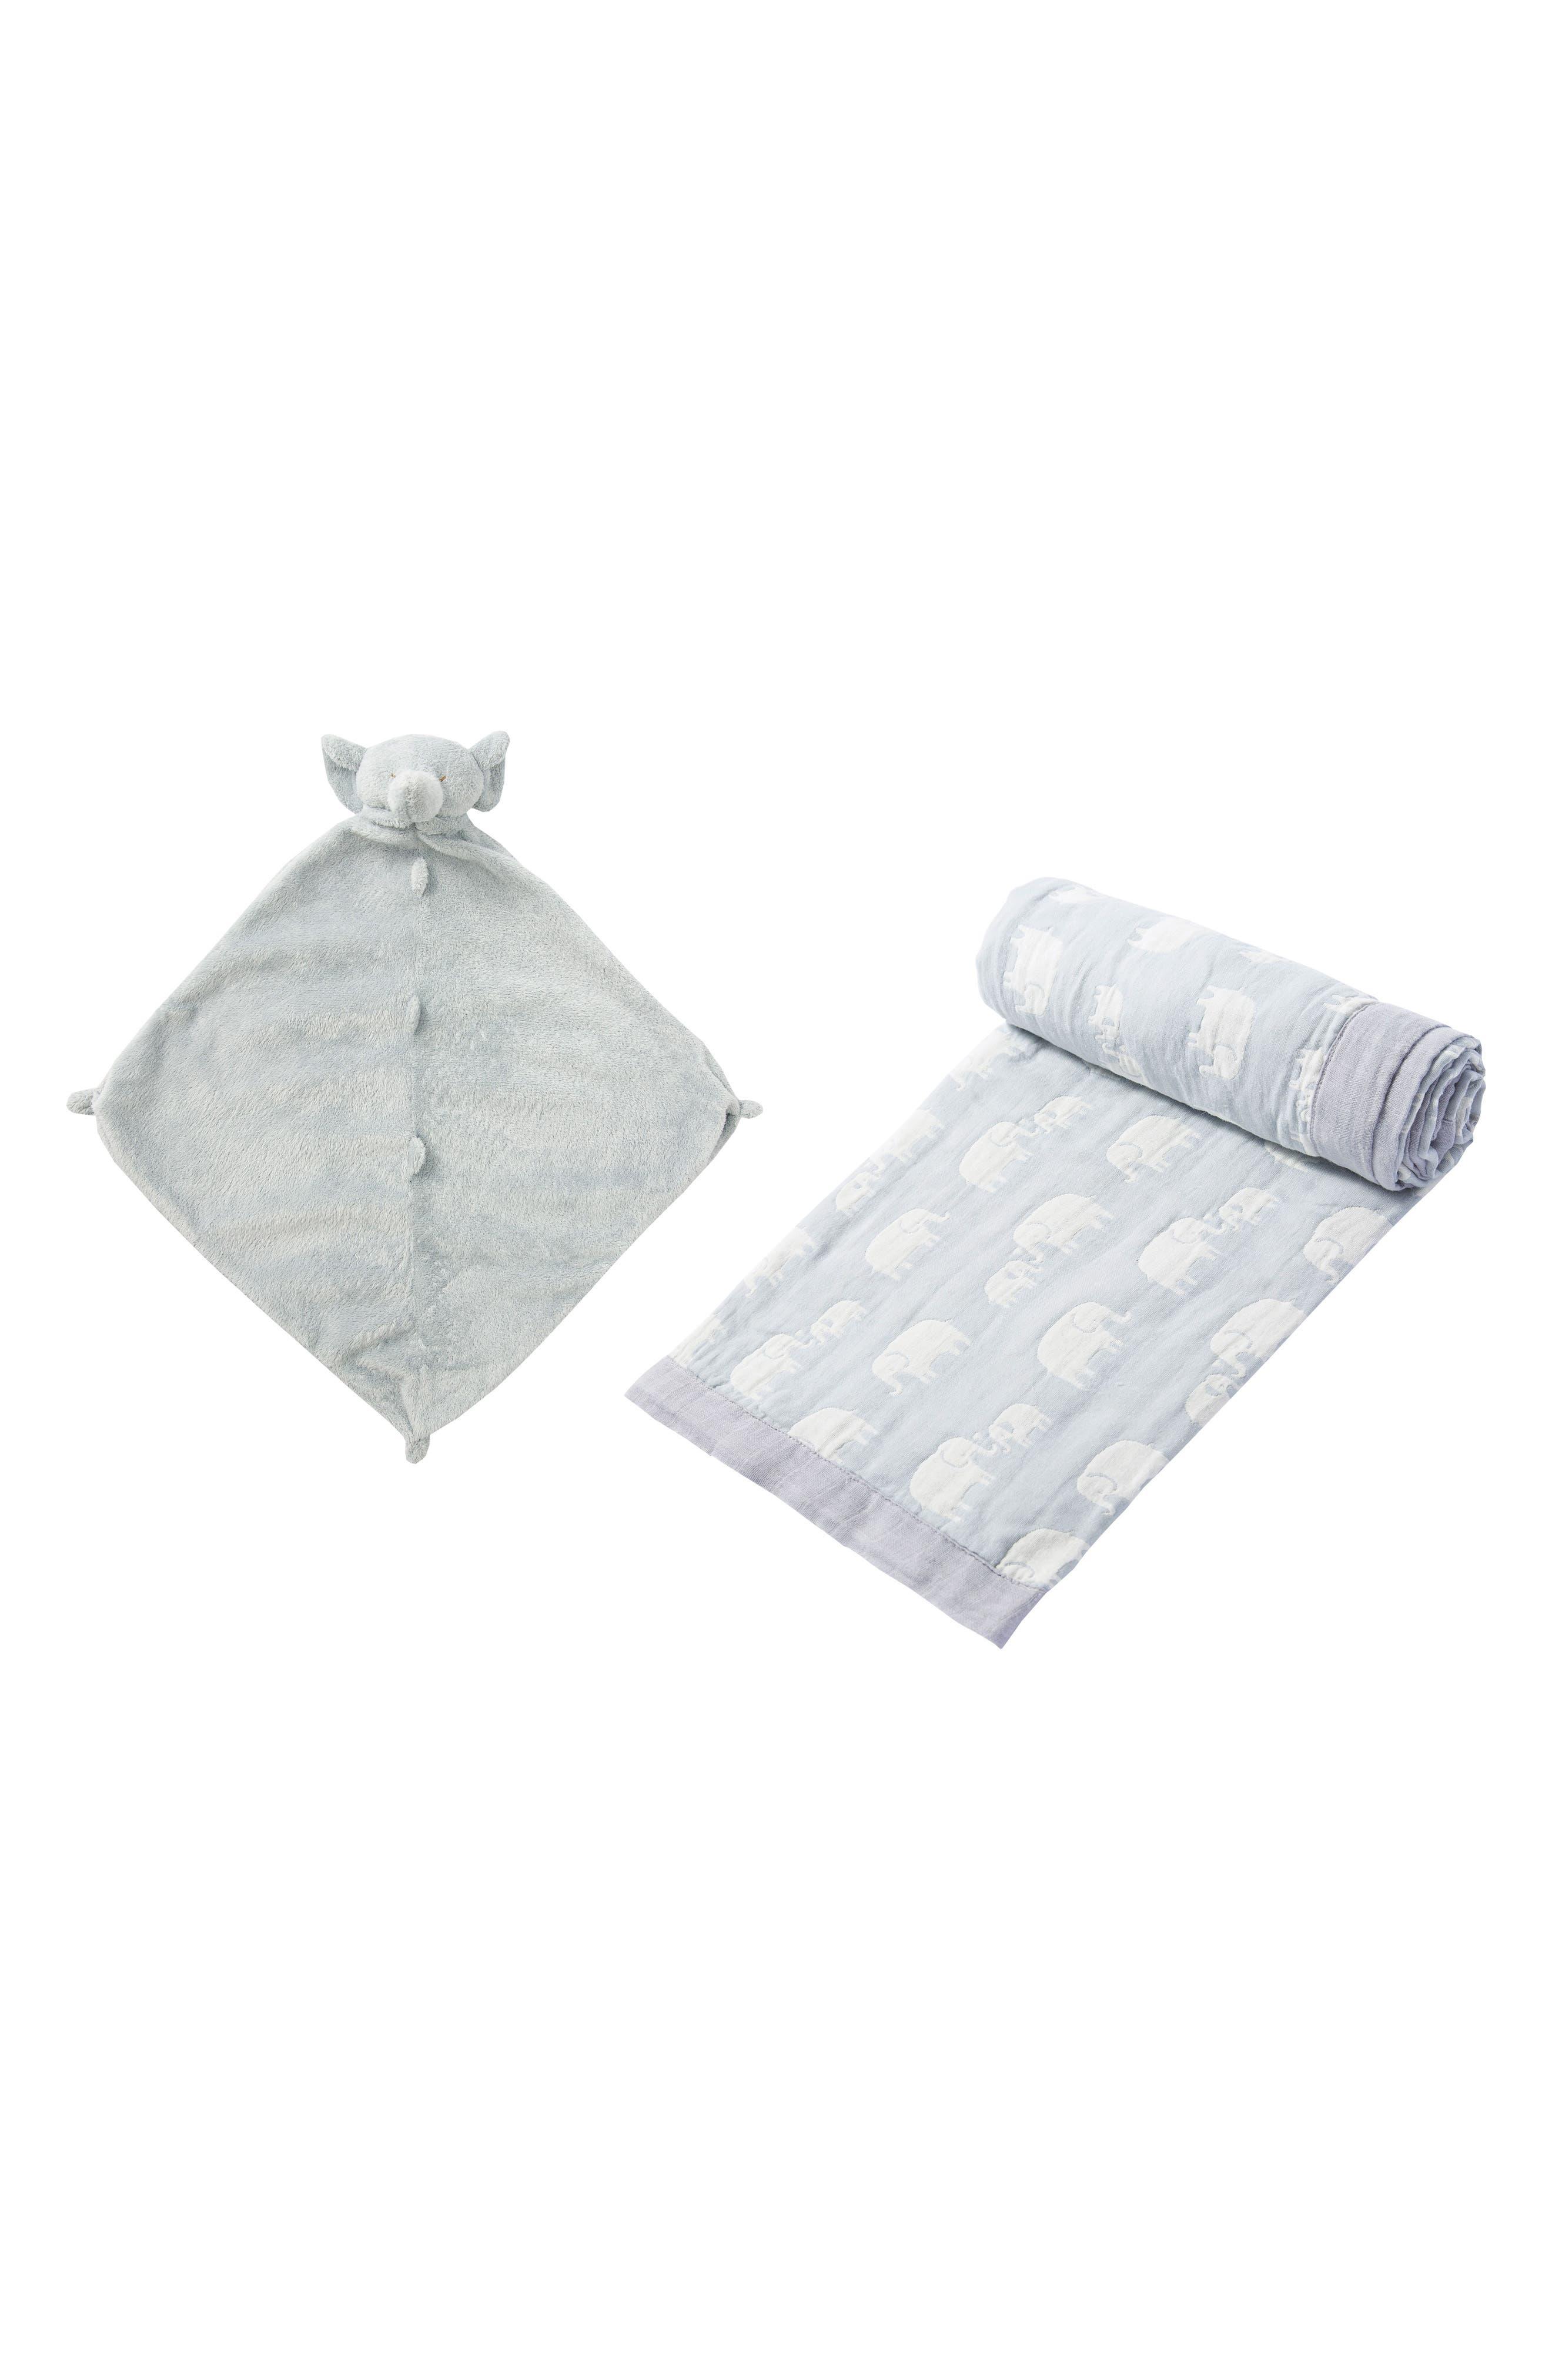 Jacquard Blanket & Blankie Set,                         Main,                         color, 020